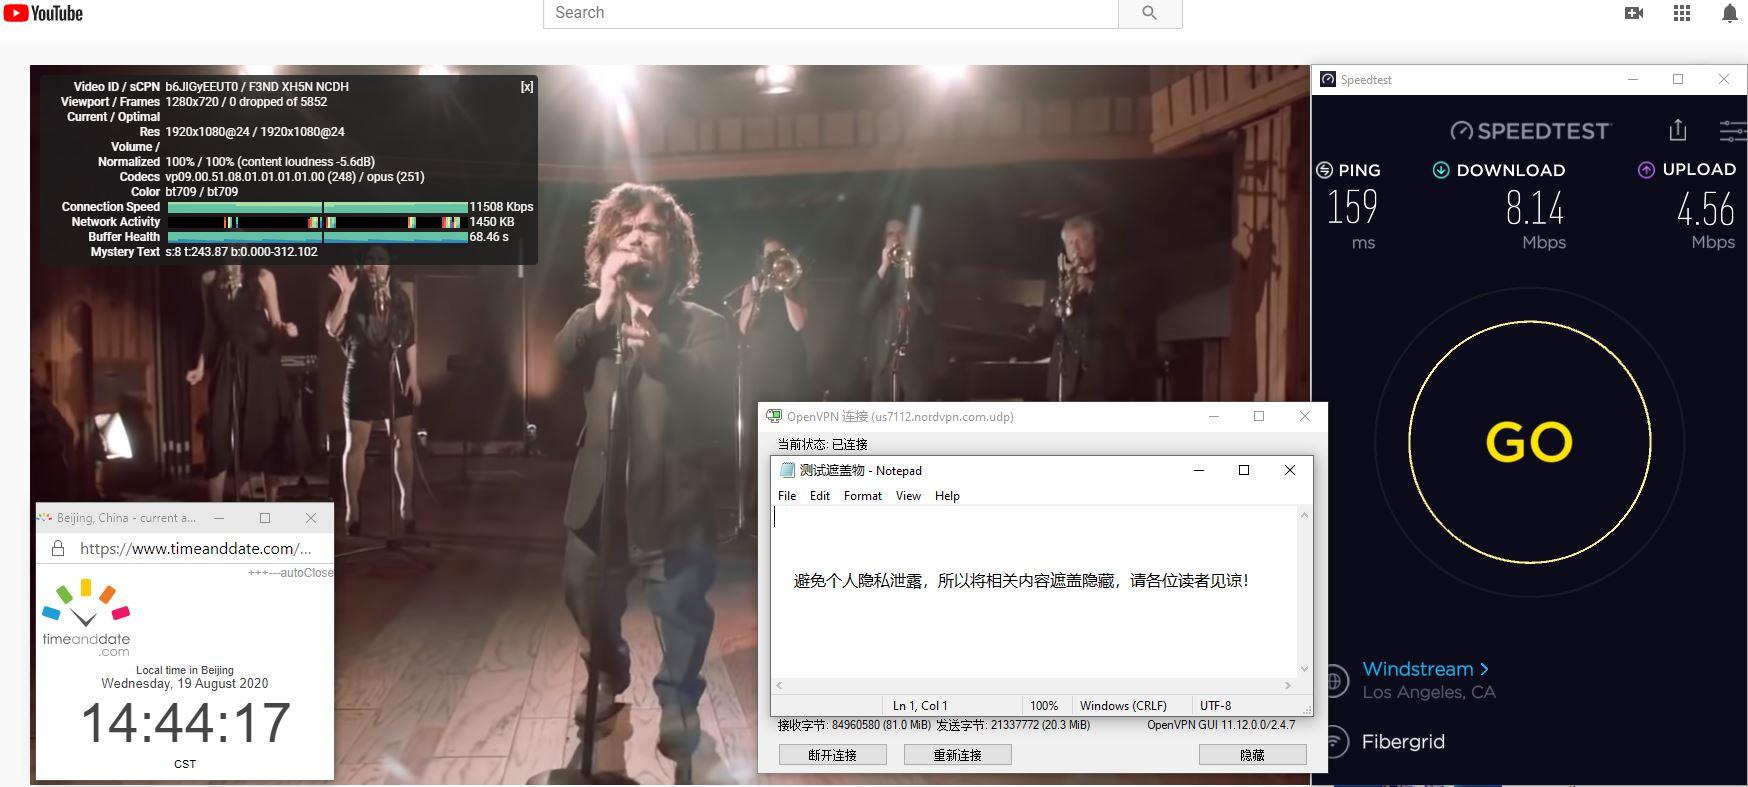 Windows10 NordVPN OpenVPN us7112 中国VPN 翻墙 科学上网 翻墙速度测试 - 20200819